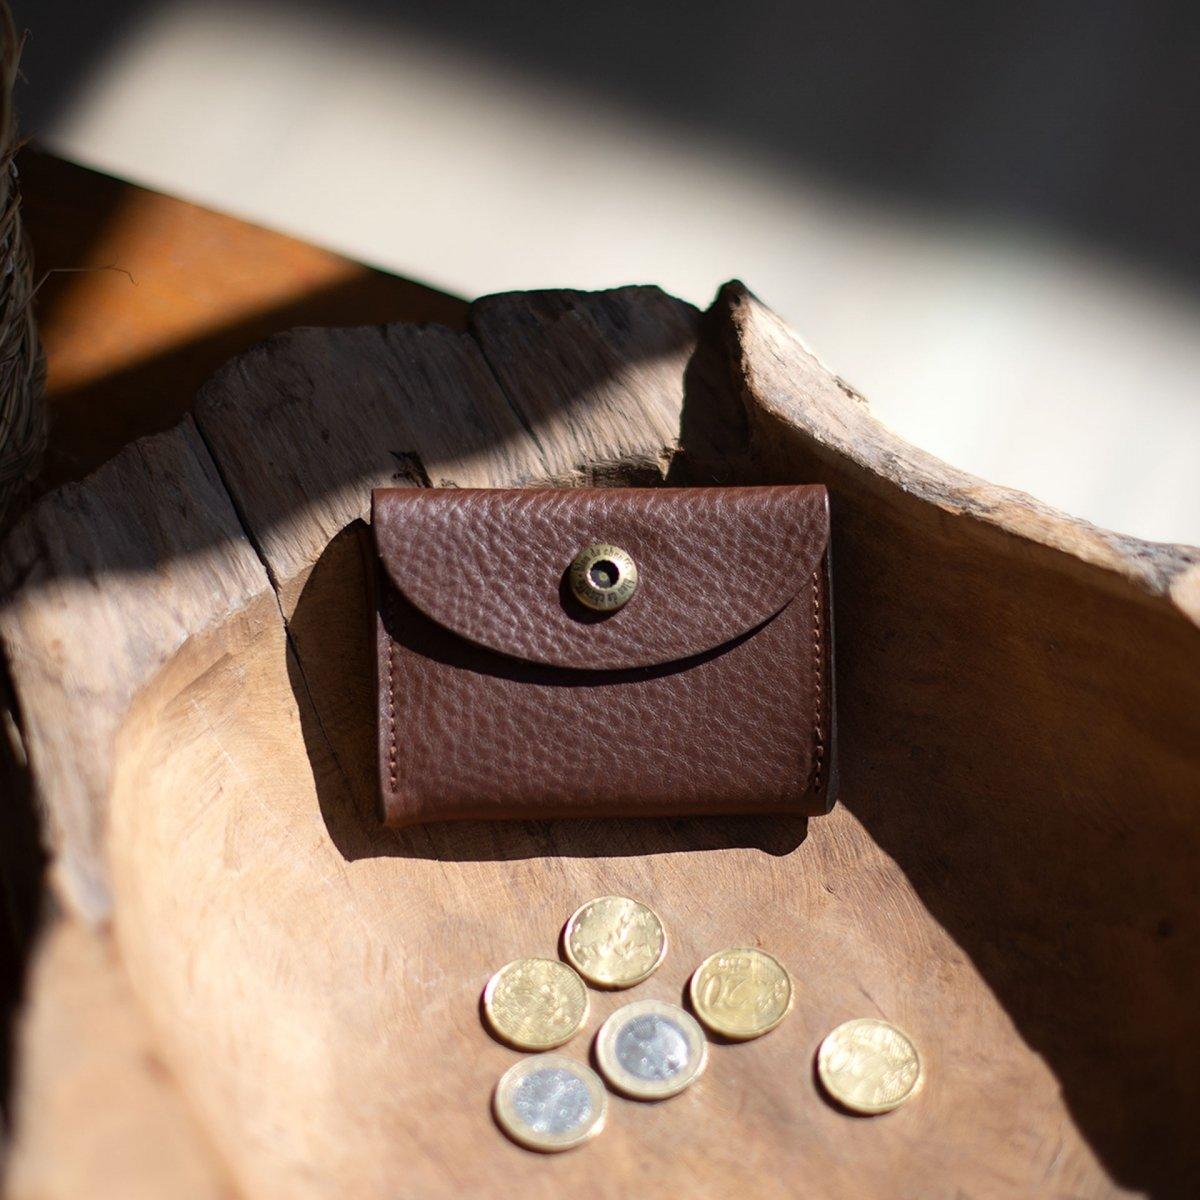 Talbin Shoemaker purse - Cuba Libre (image n°3)